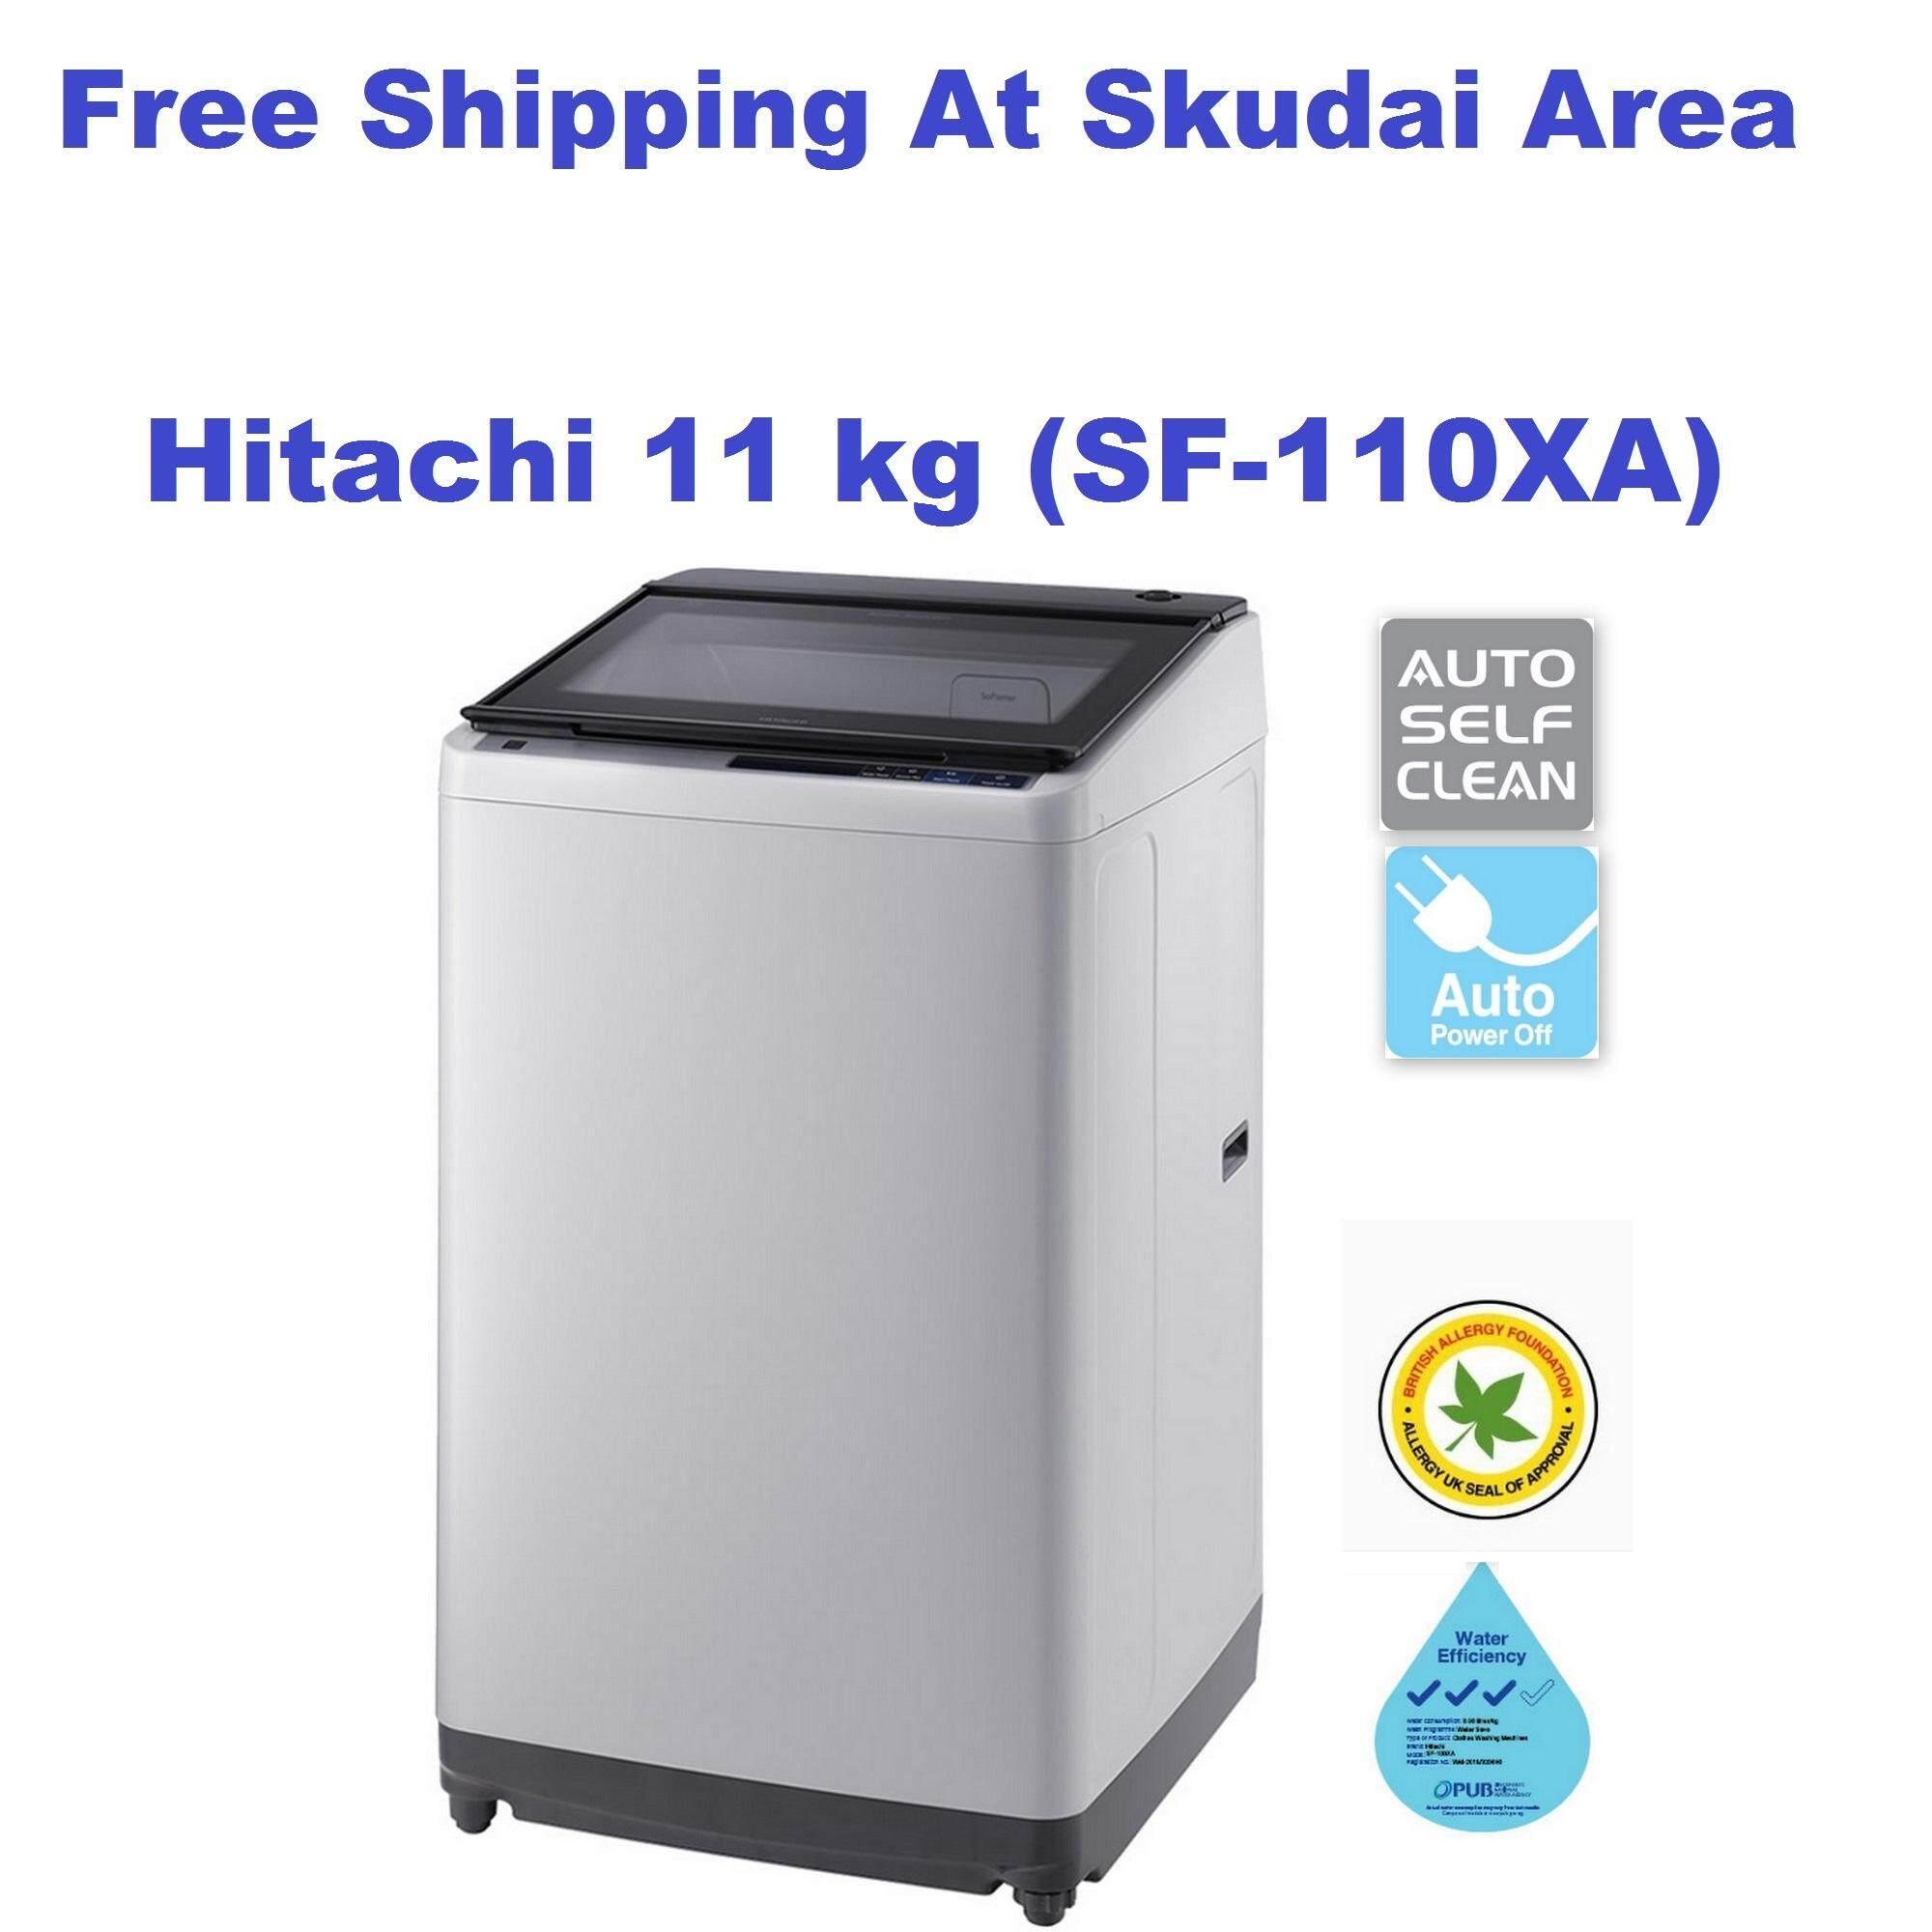 Hitachi Auto Self Clean Washing Machine - 11kg (SF-110XA)